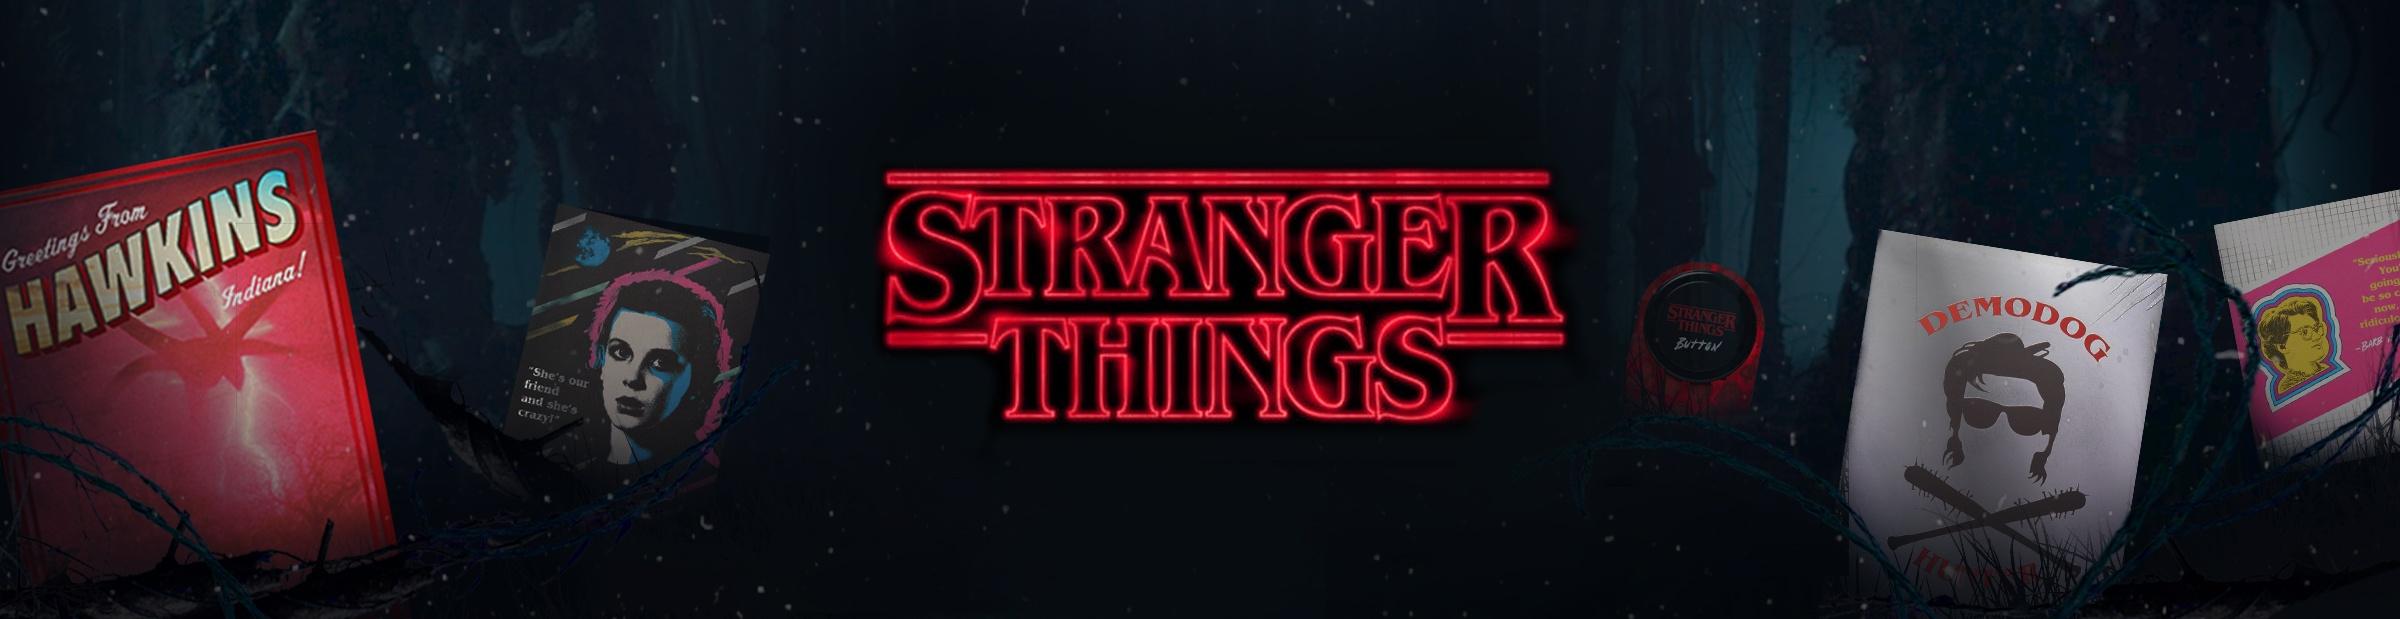 Stranger Things Product Banner